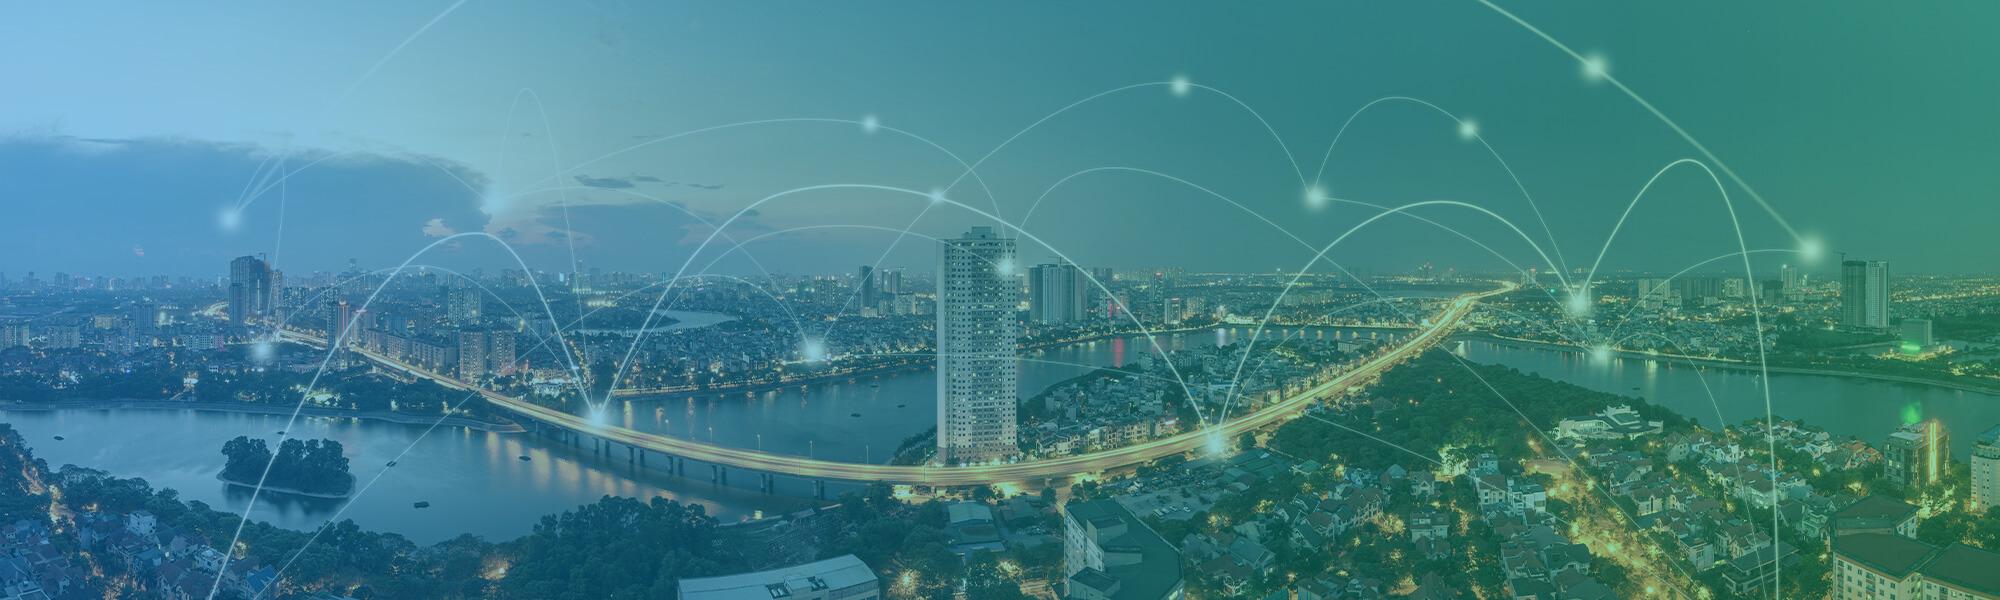 cosymap-branche-telekommunikation